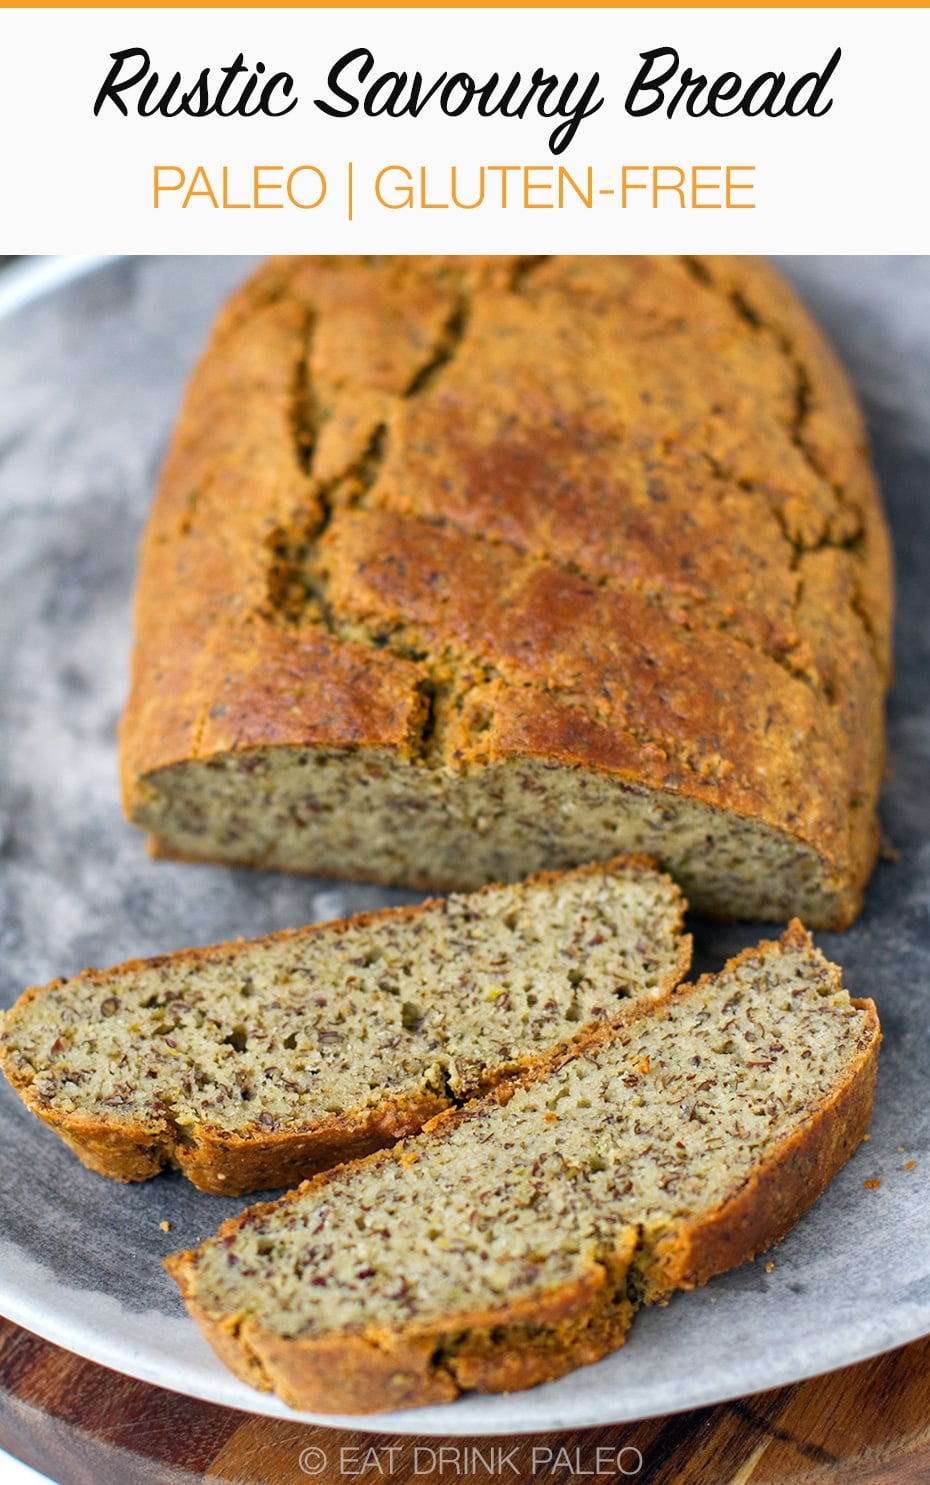 Rustic Savoury Paleo Bread Recipe